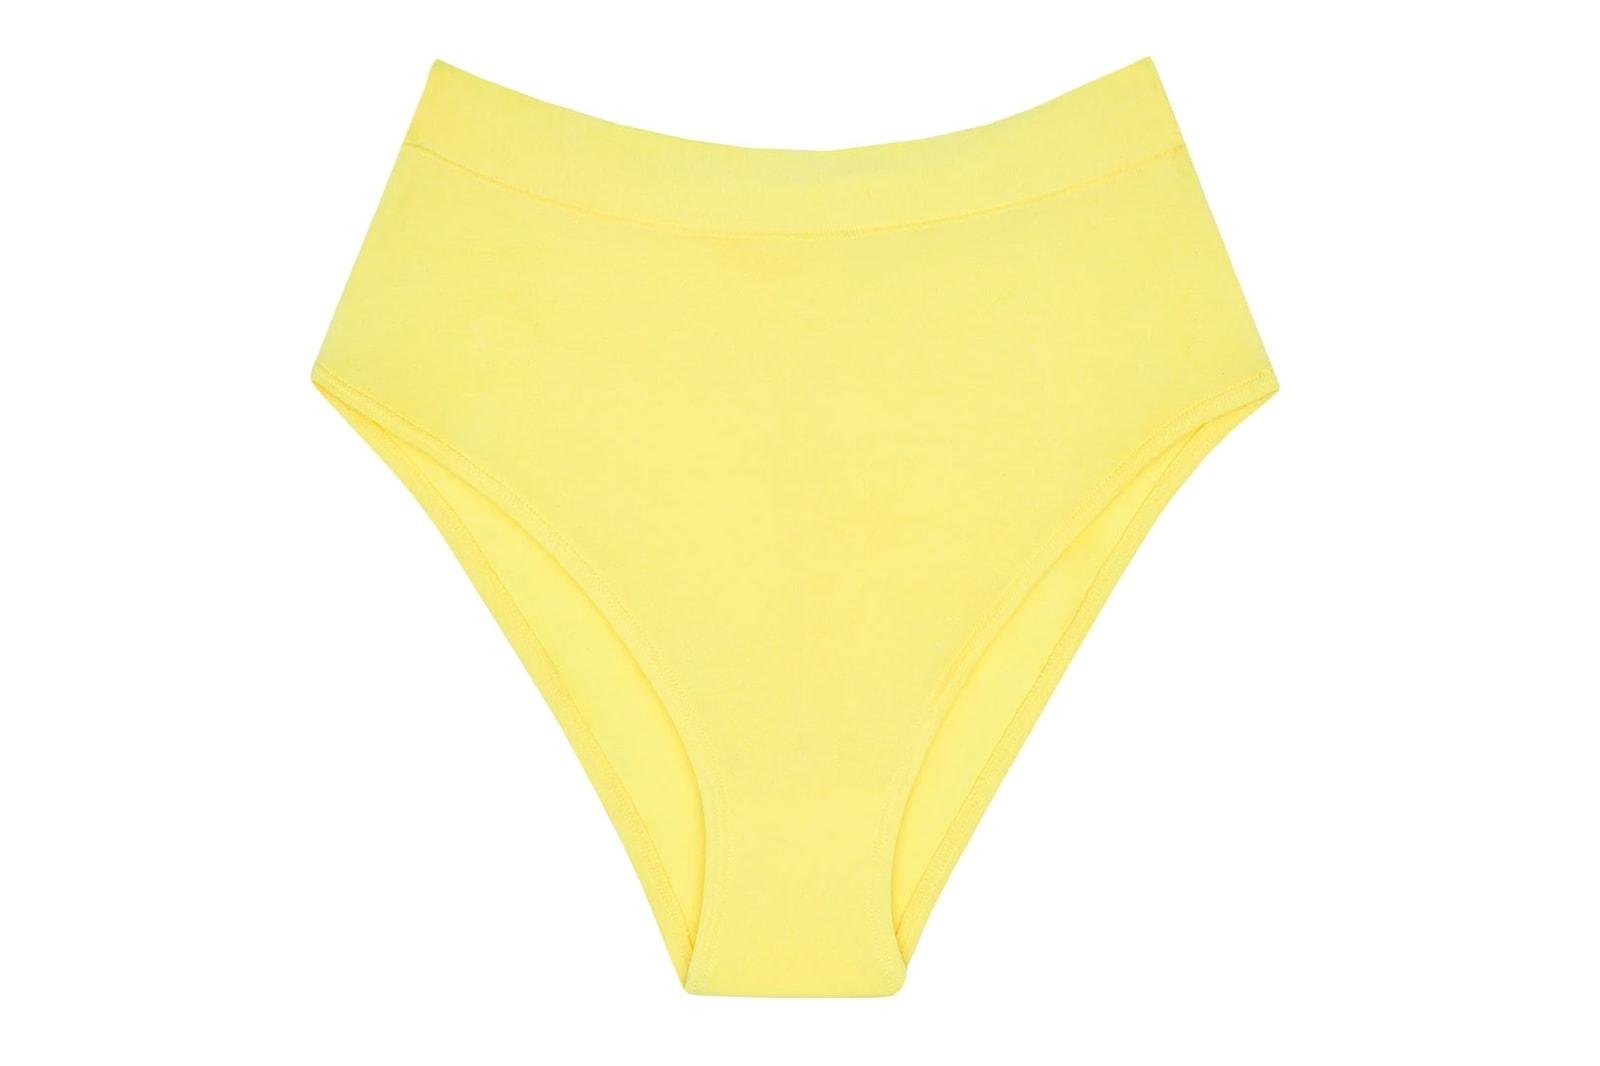 big panties knickers underwear granny pants trend high waisted briefs la perla SKIMS savage x fenty